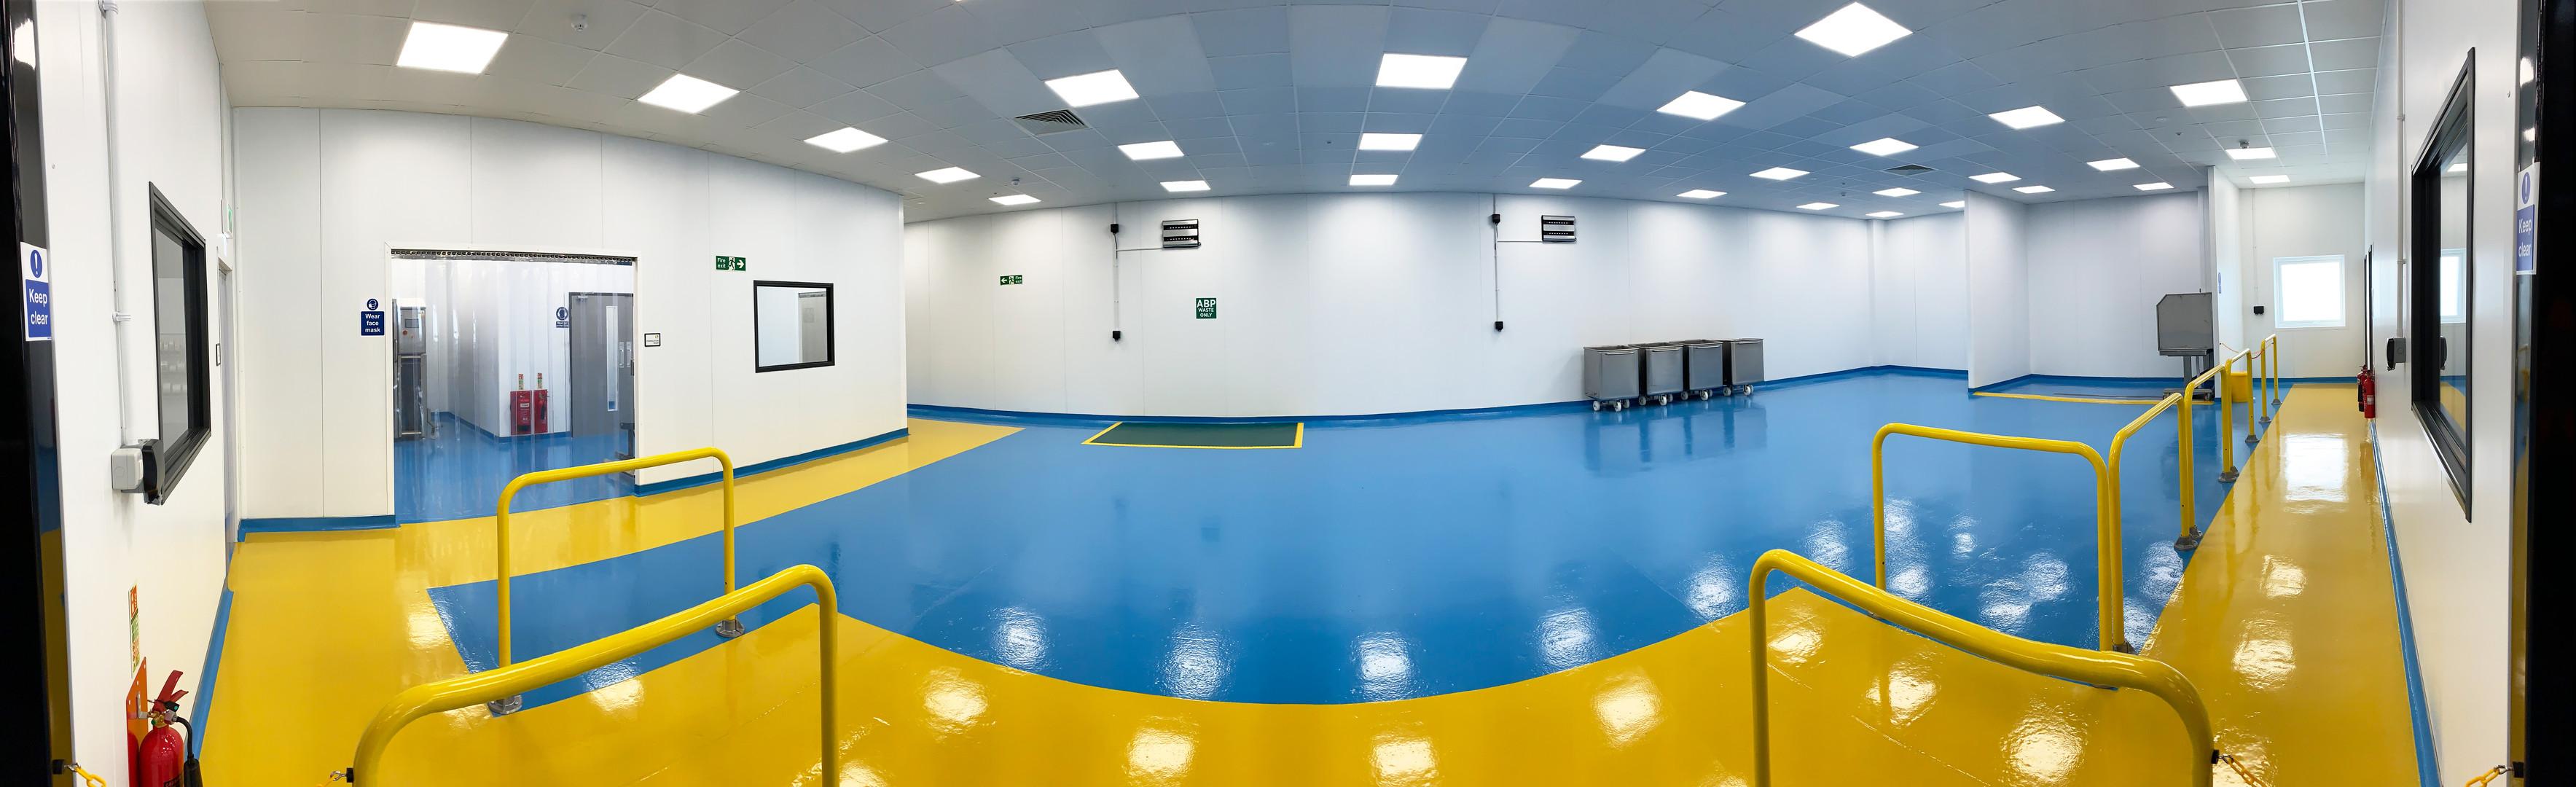 Production-Floor-Panorama.jpg